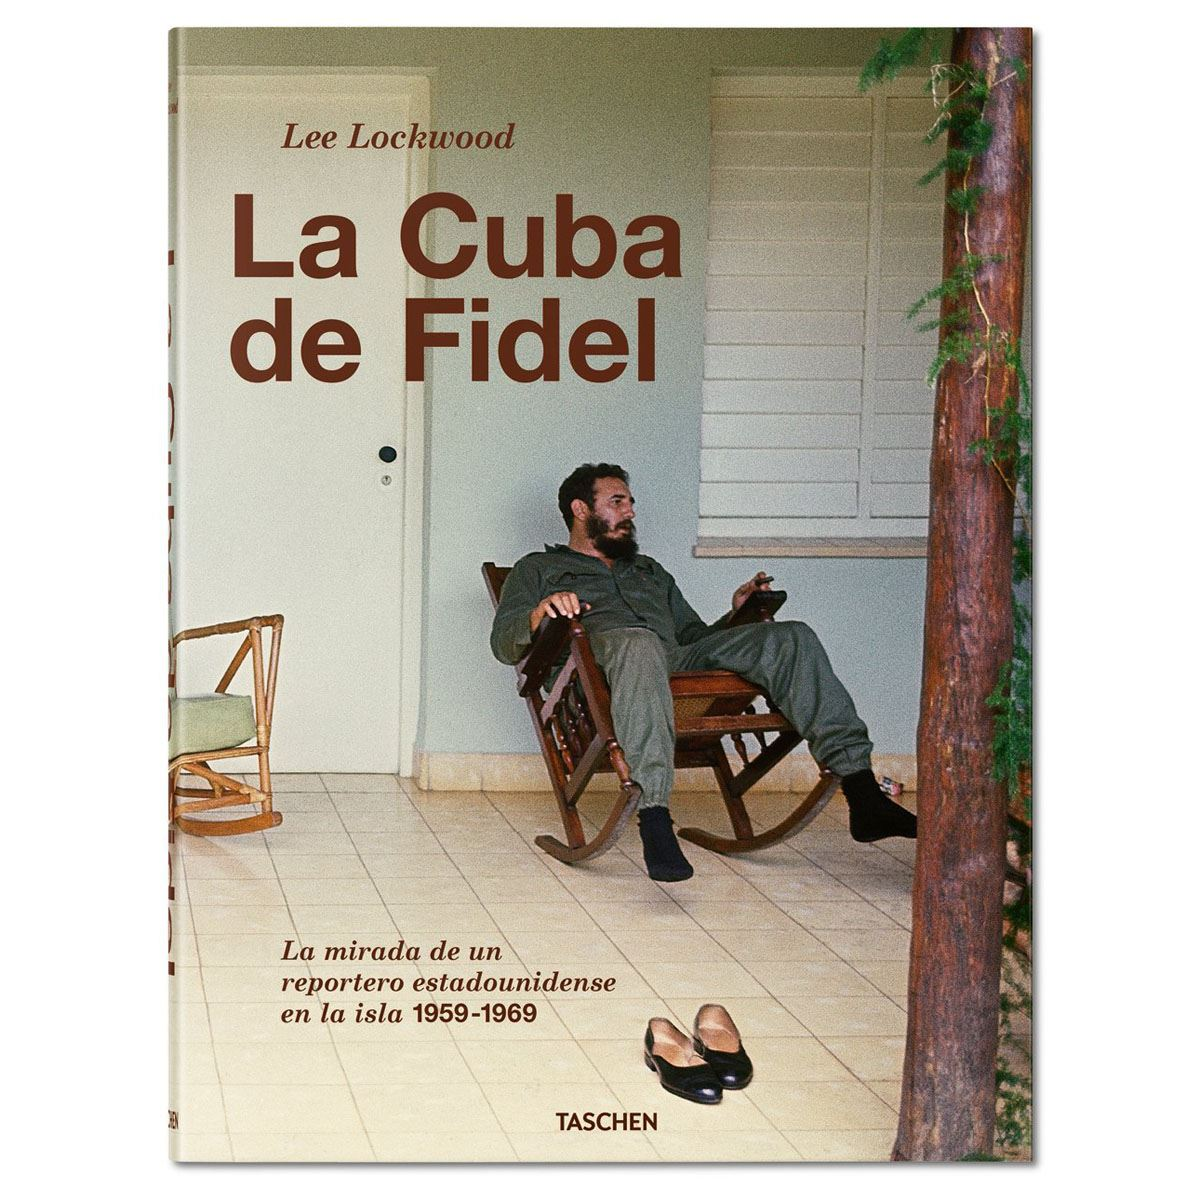 La Cuba de Fidel